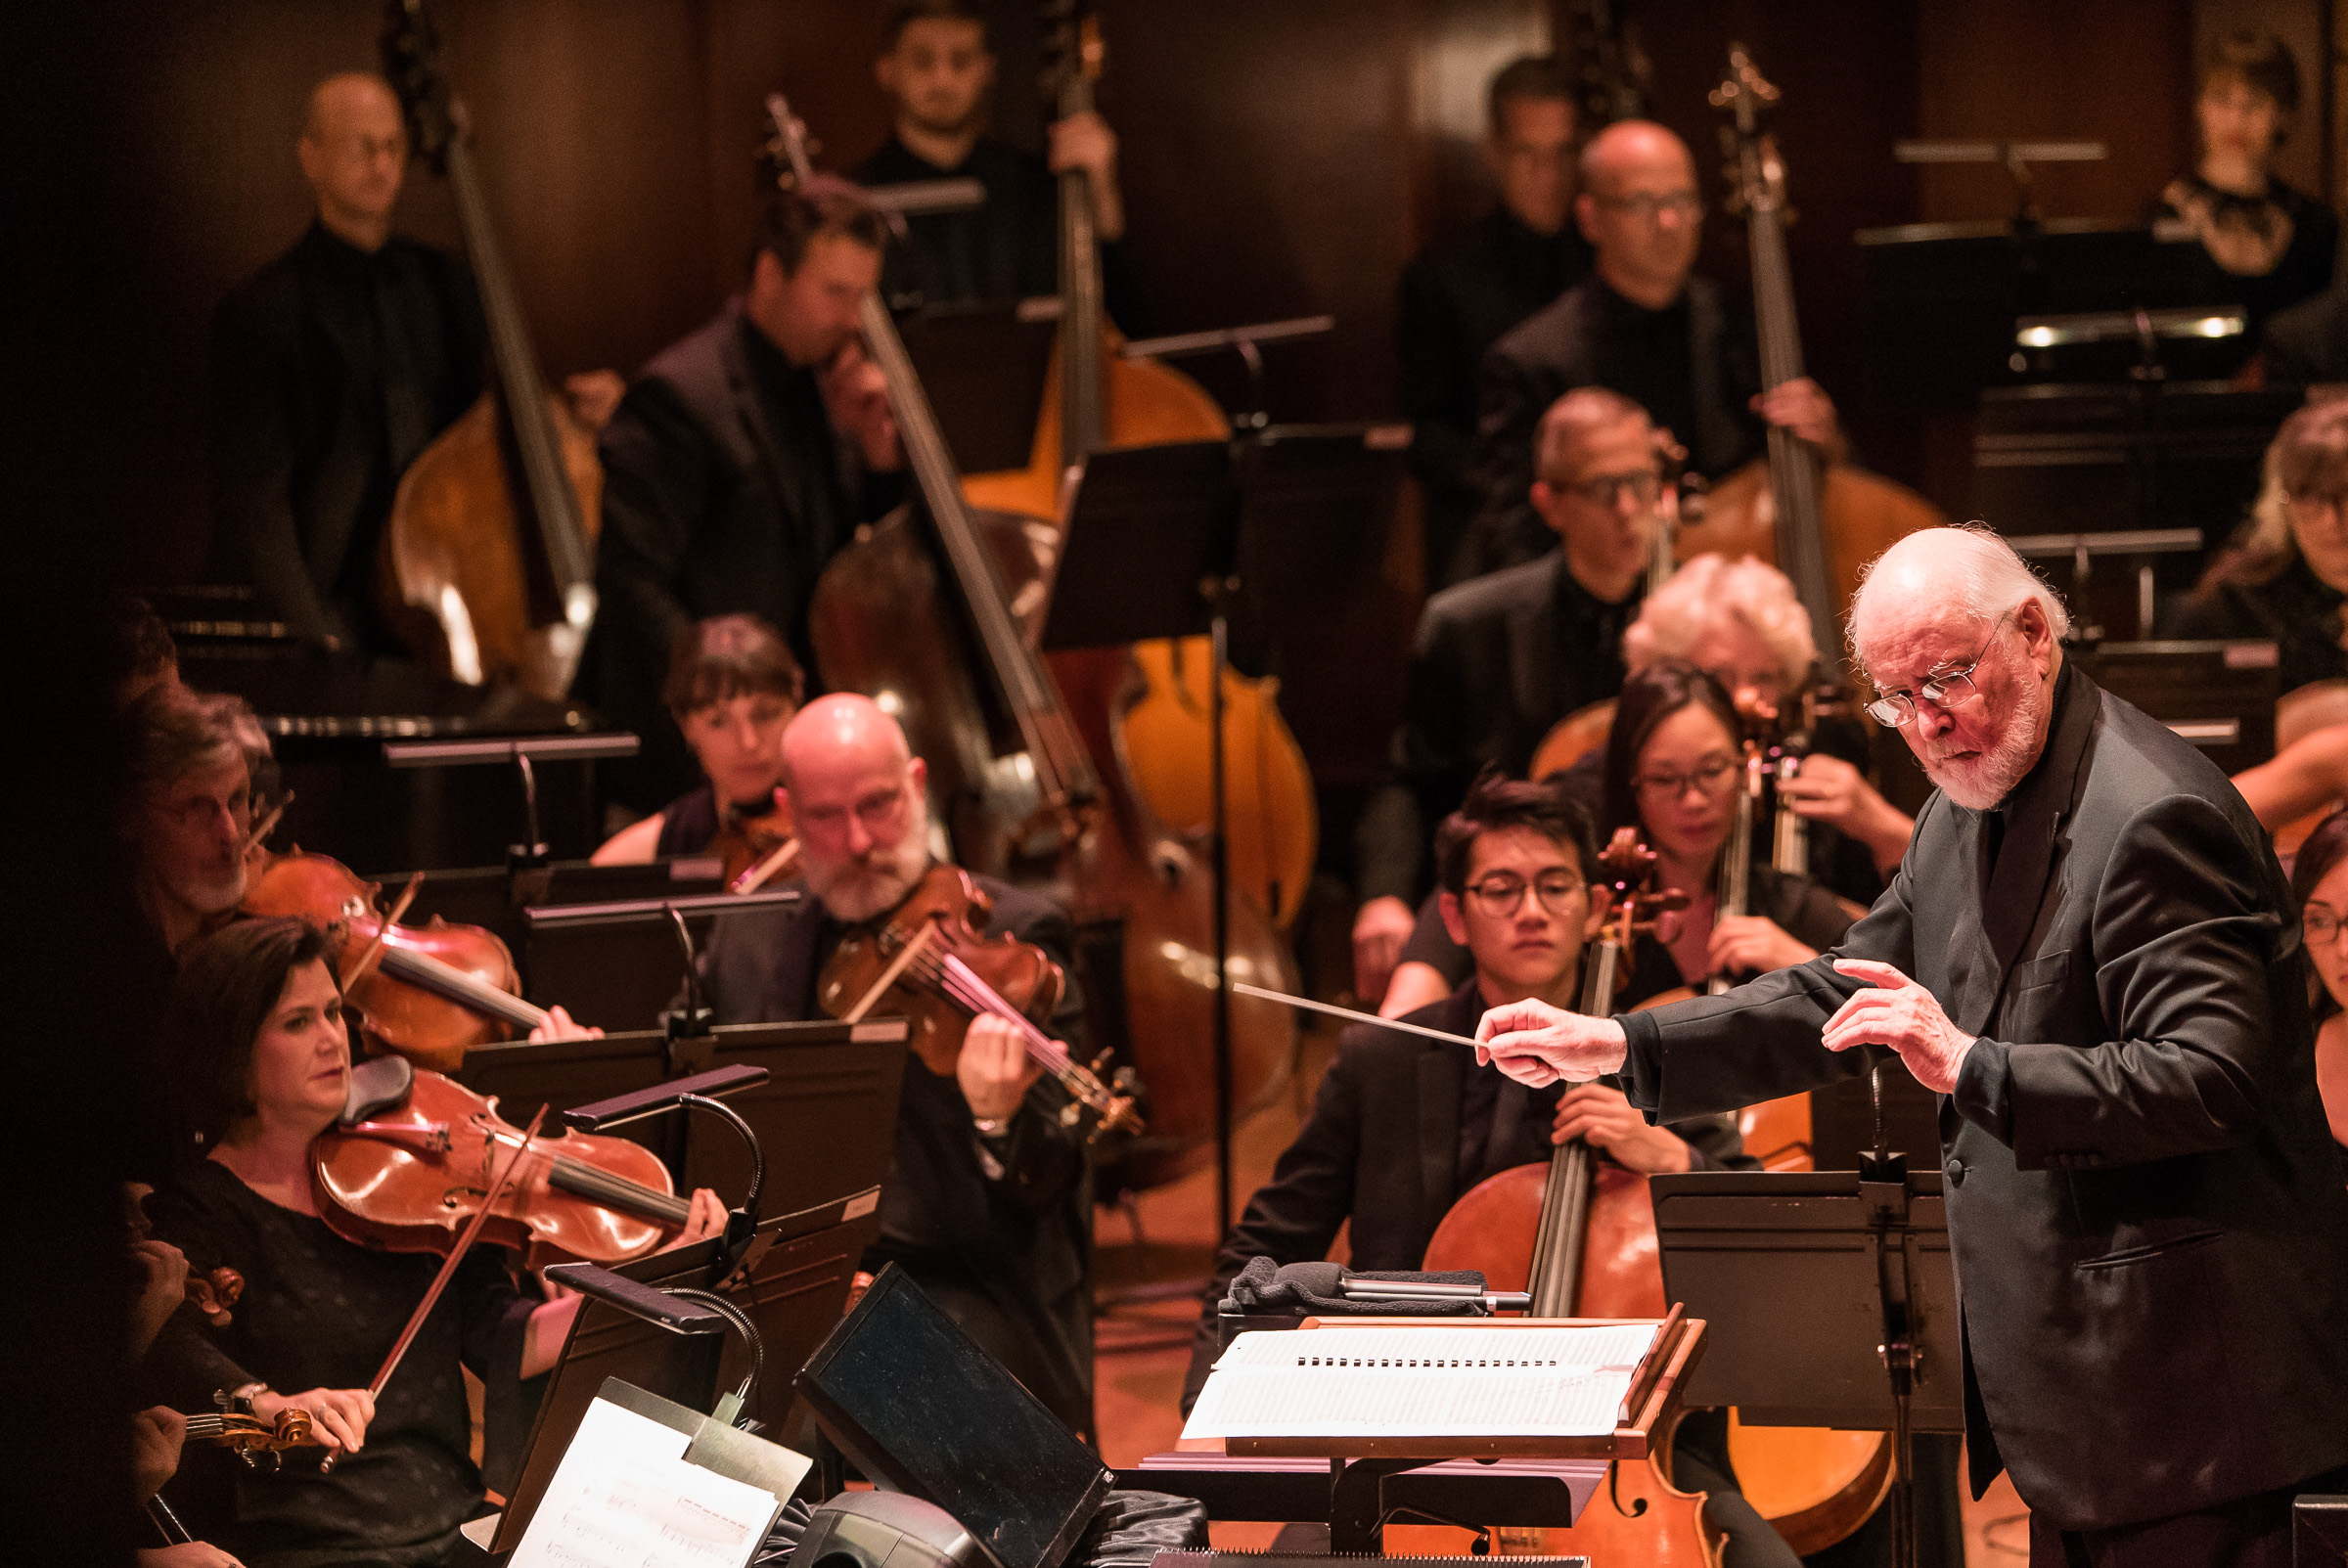 brandon_patoc_john_williams_Steven_Spielberg, Seattle_Symphony_Orchestra_Conert_0042.JPG